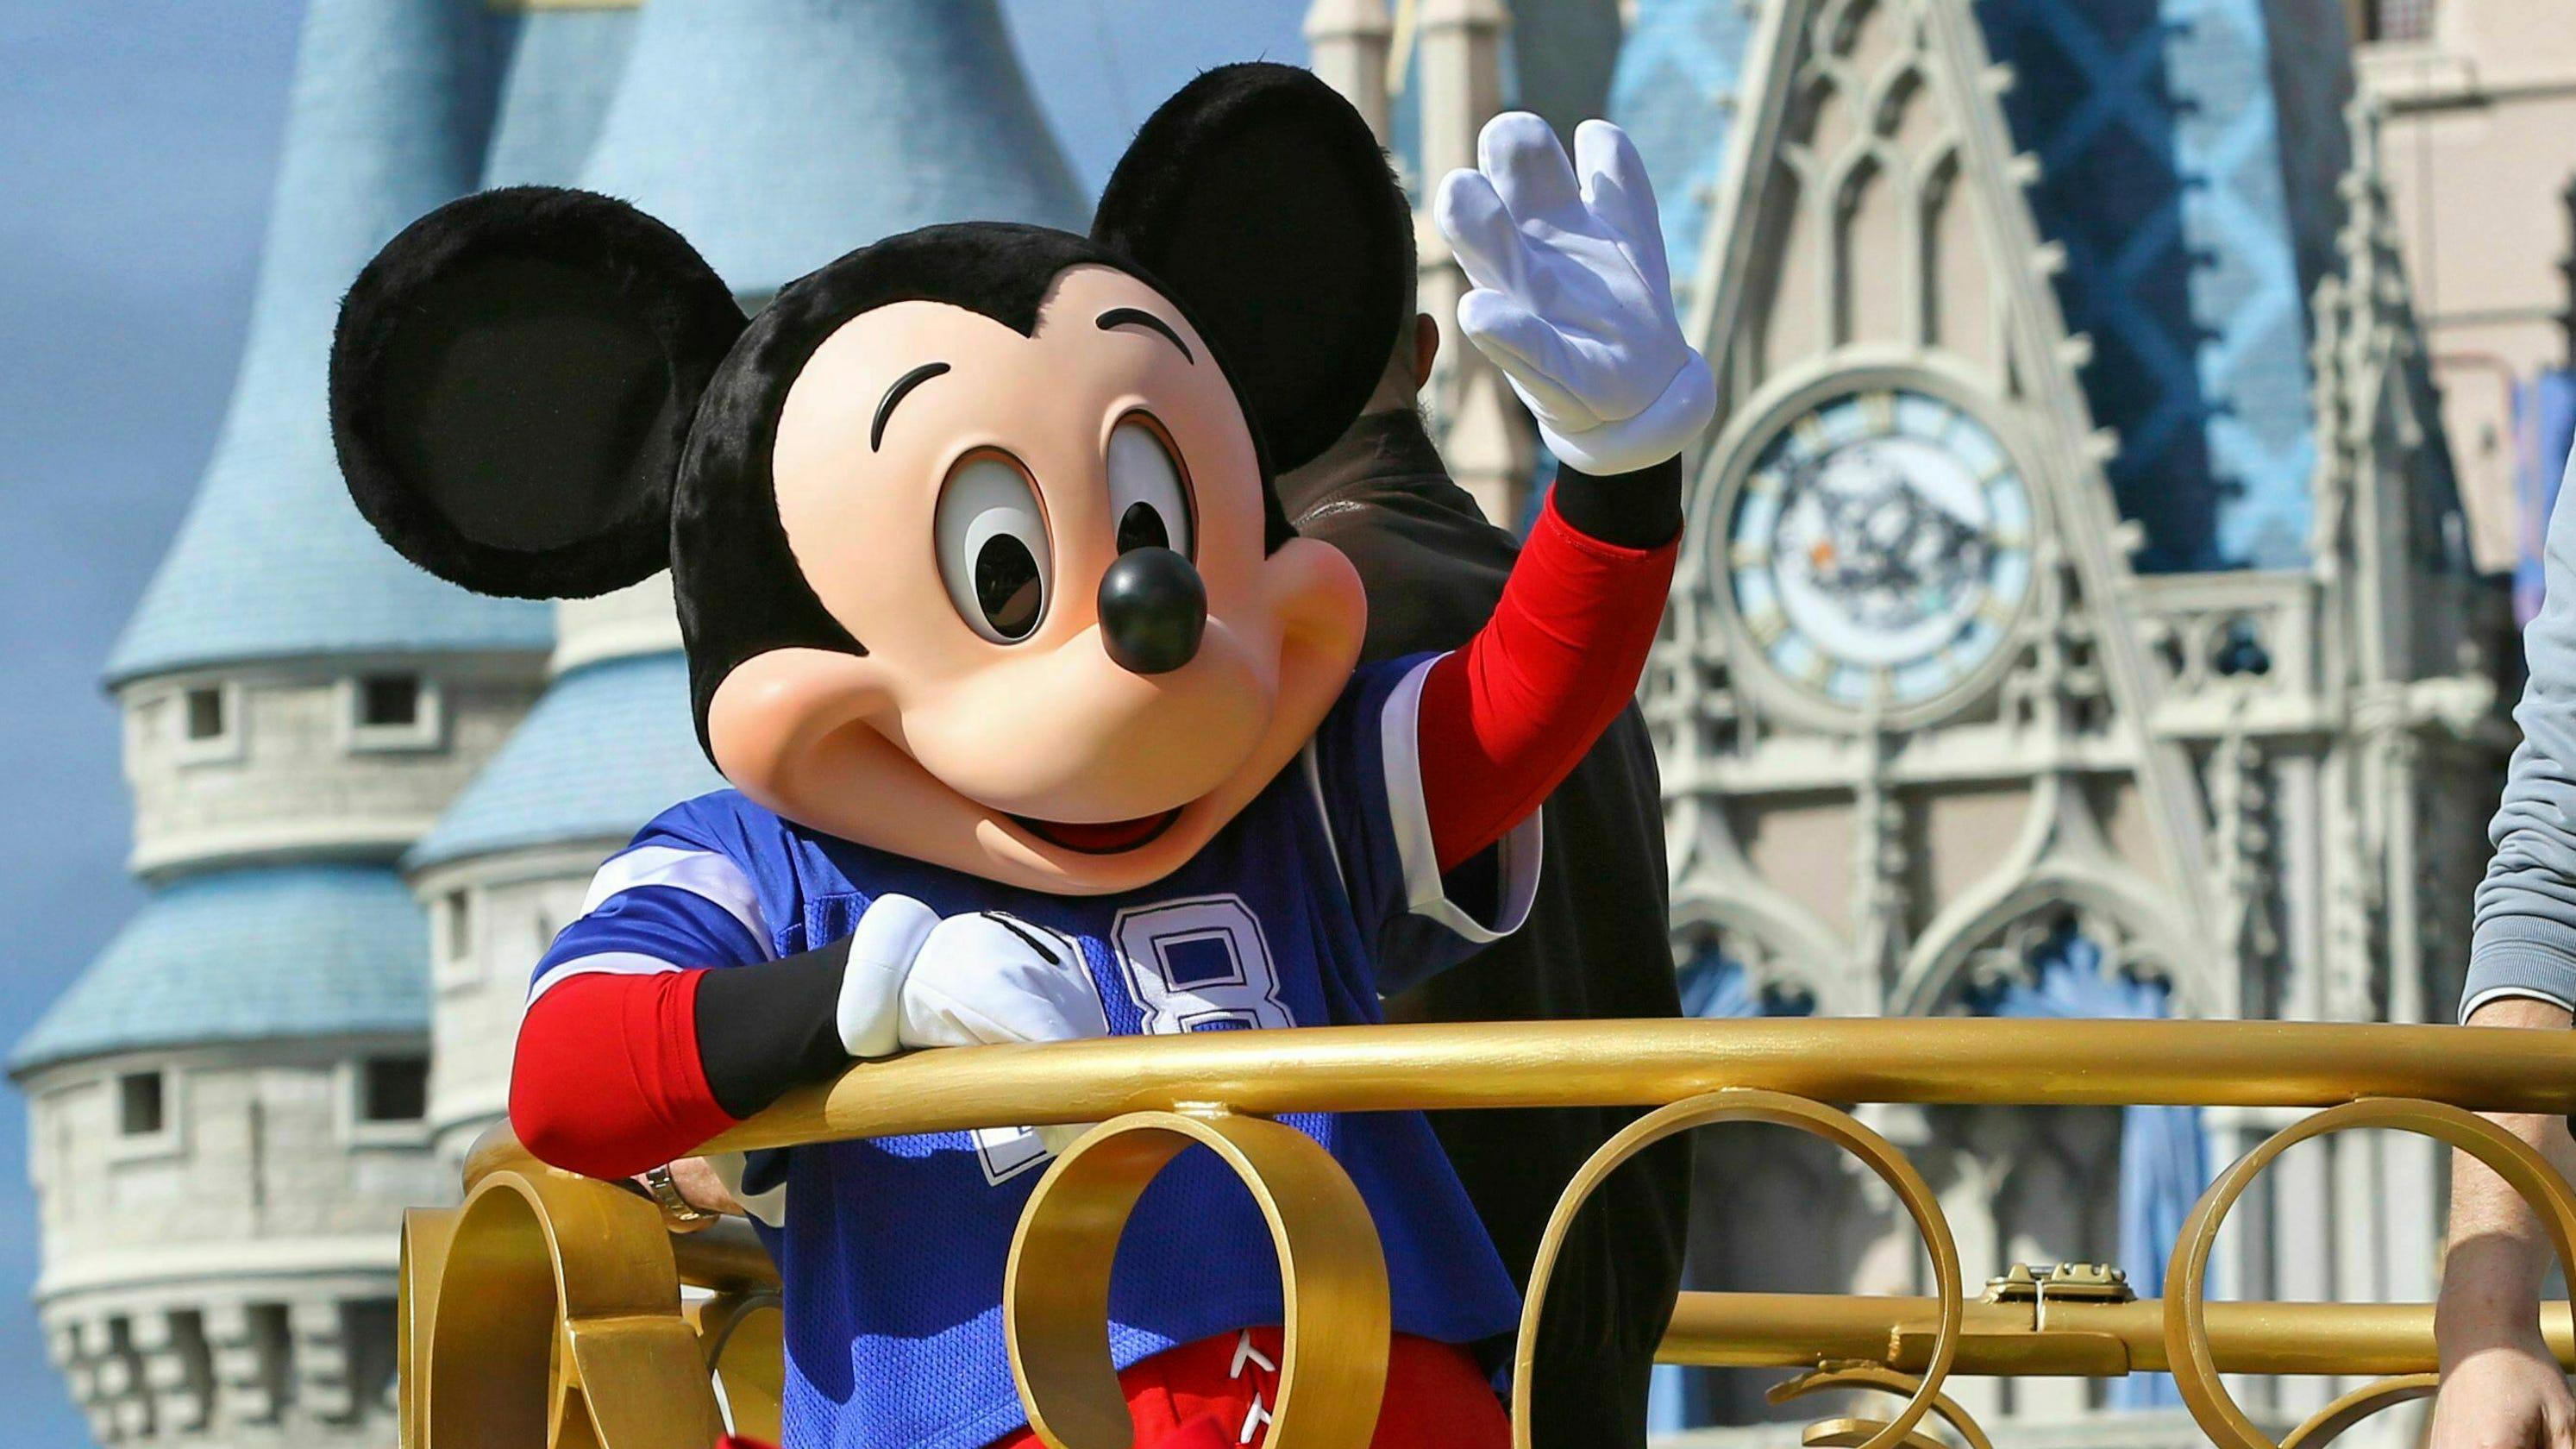 Disney characters win union shakeup at Walt Disney World